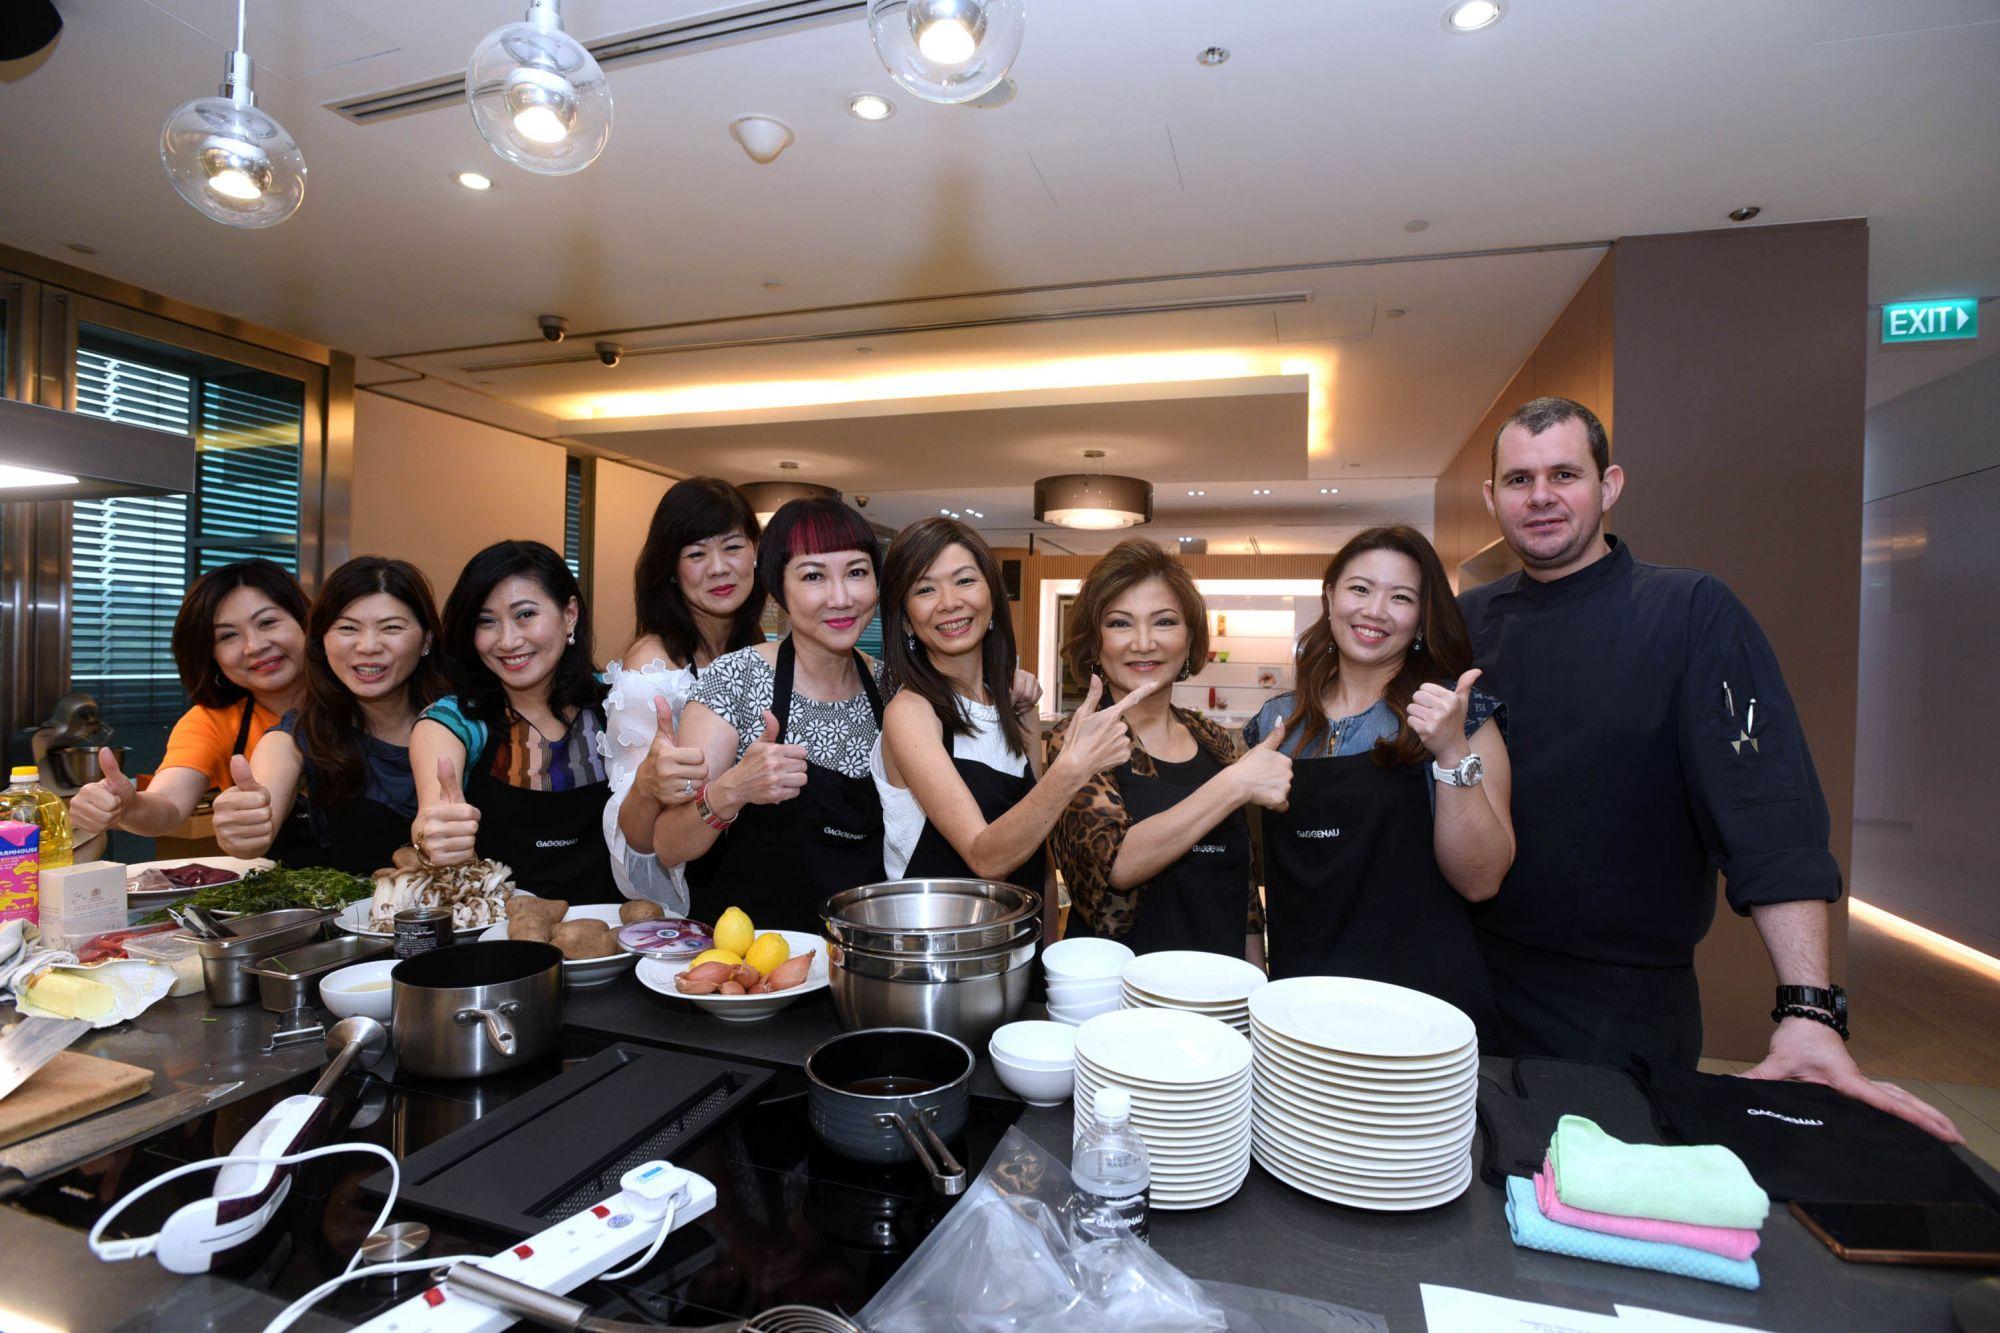 Lilian Low, Caroline Quach, Tan Khar Nai, Yvonne Zee, Frances Low, Dolly Cheong, Audrey Mico, Siow Yin Yin, Stephan Zoisl